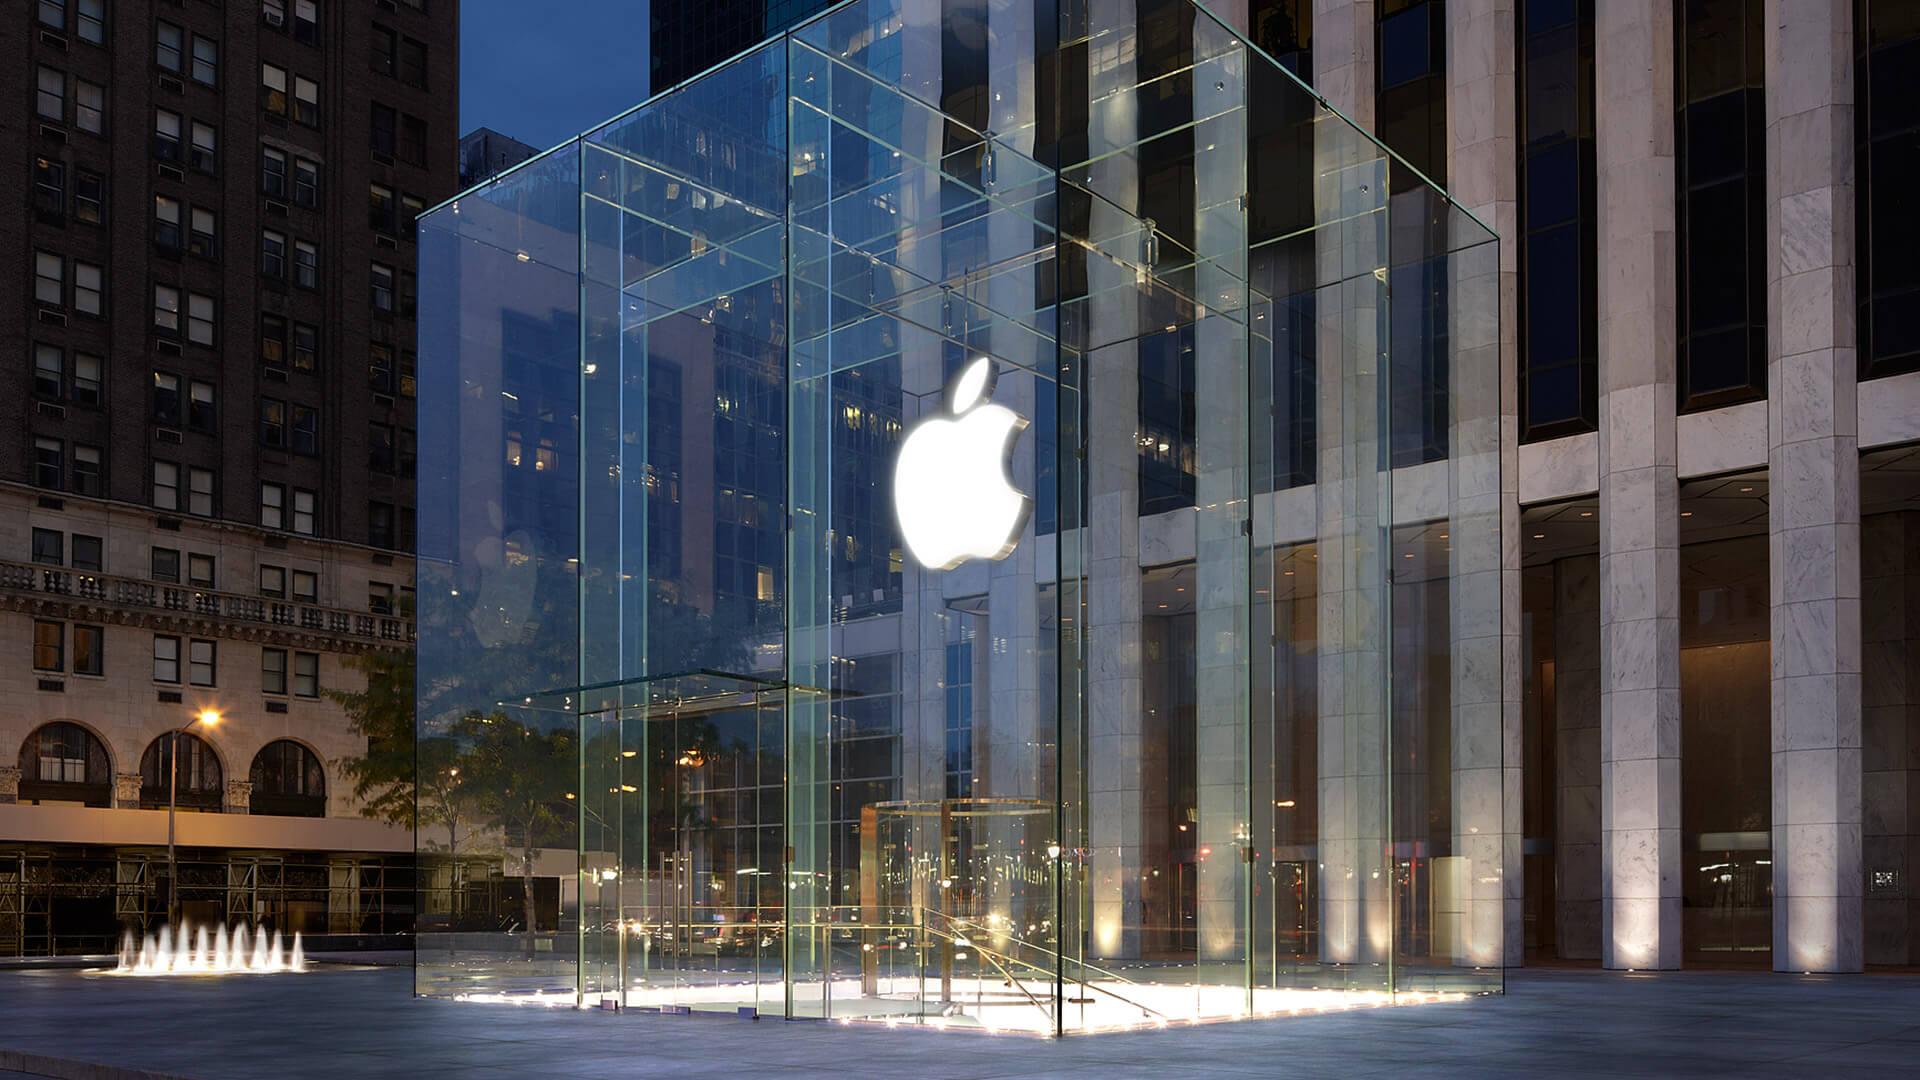 apple store btc)